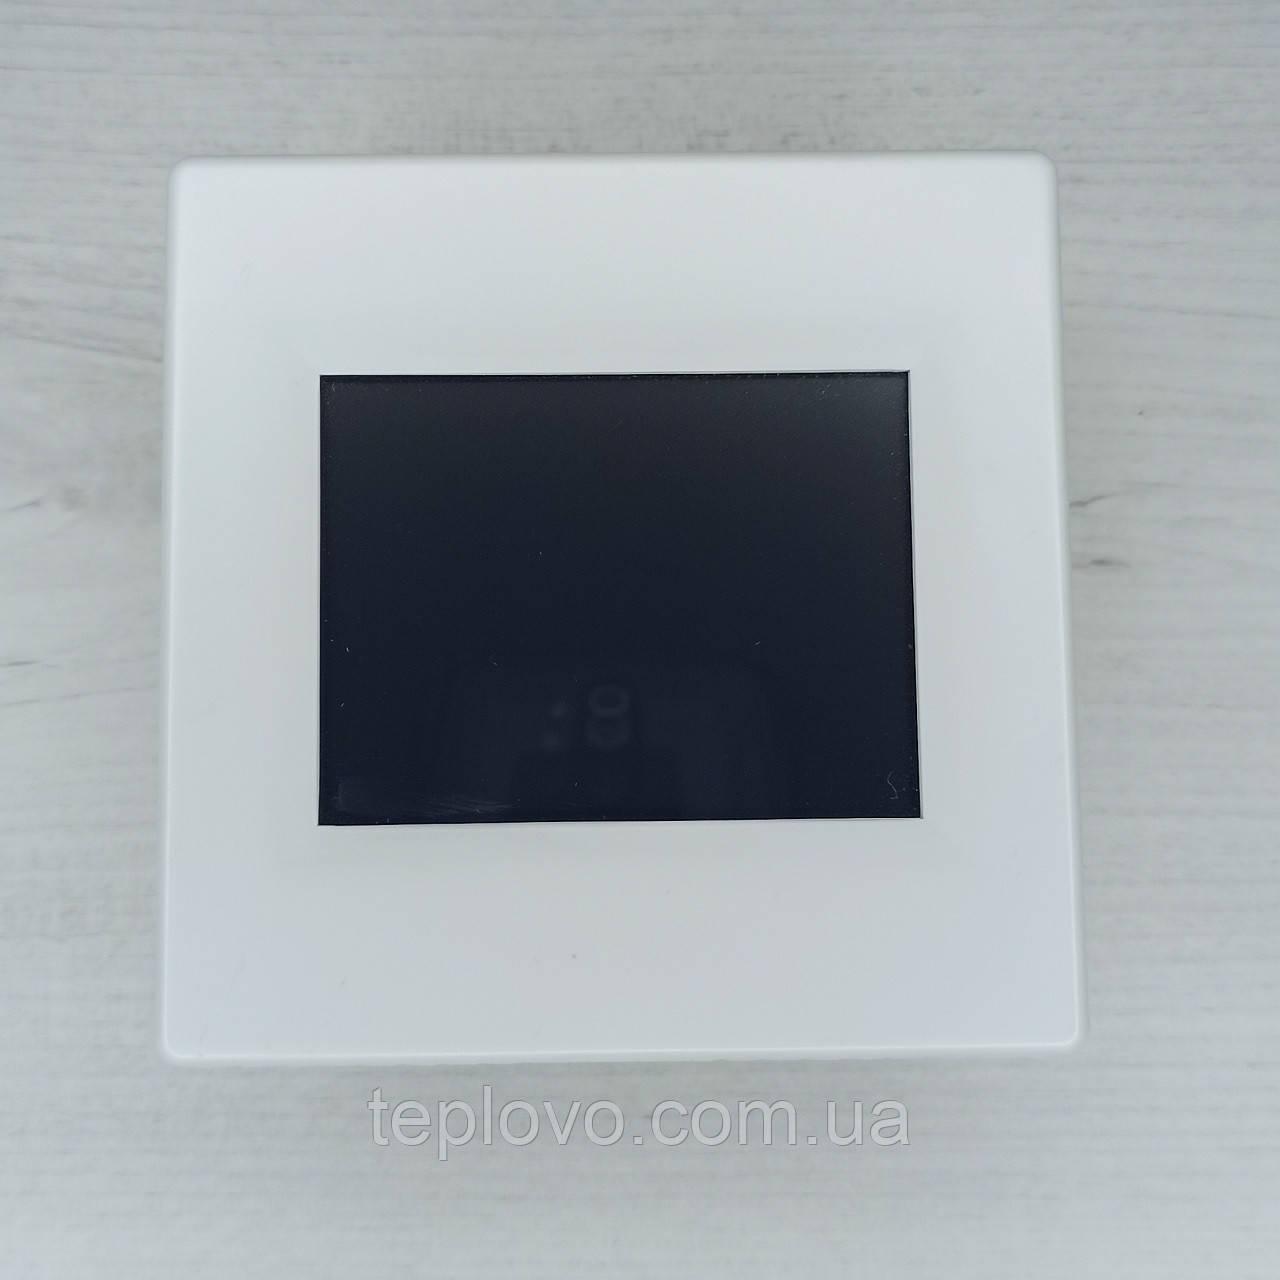 Терморегулятор программируемый Fenix TFT (Франция) для теплого пола